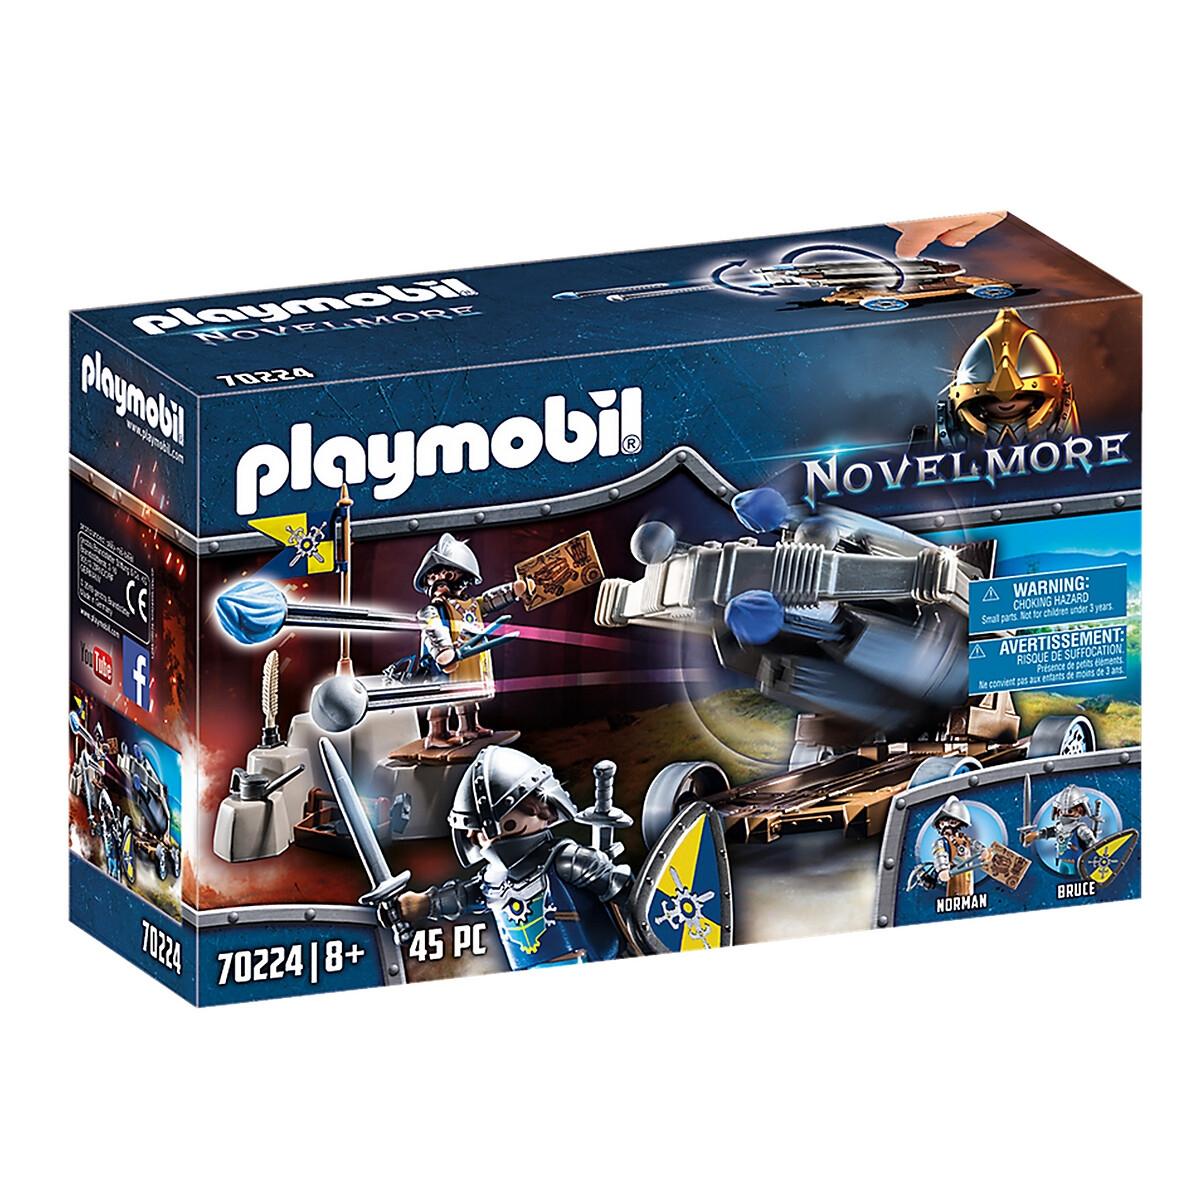 Playmobil - Playmobil Balista de água de Novelmore 70224